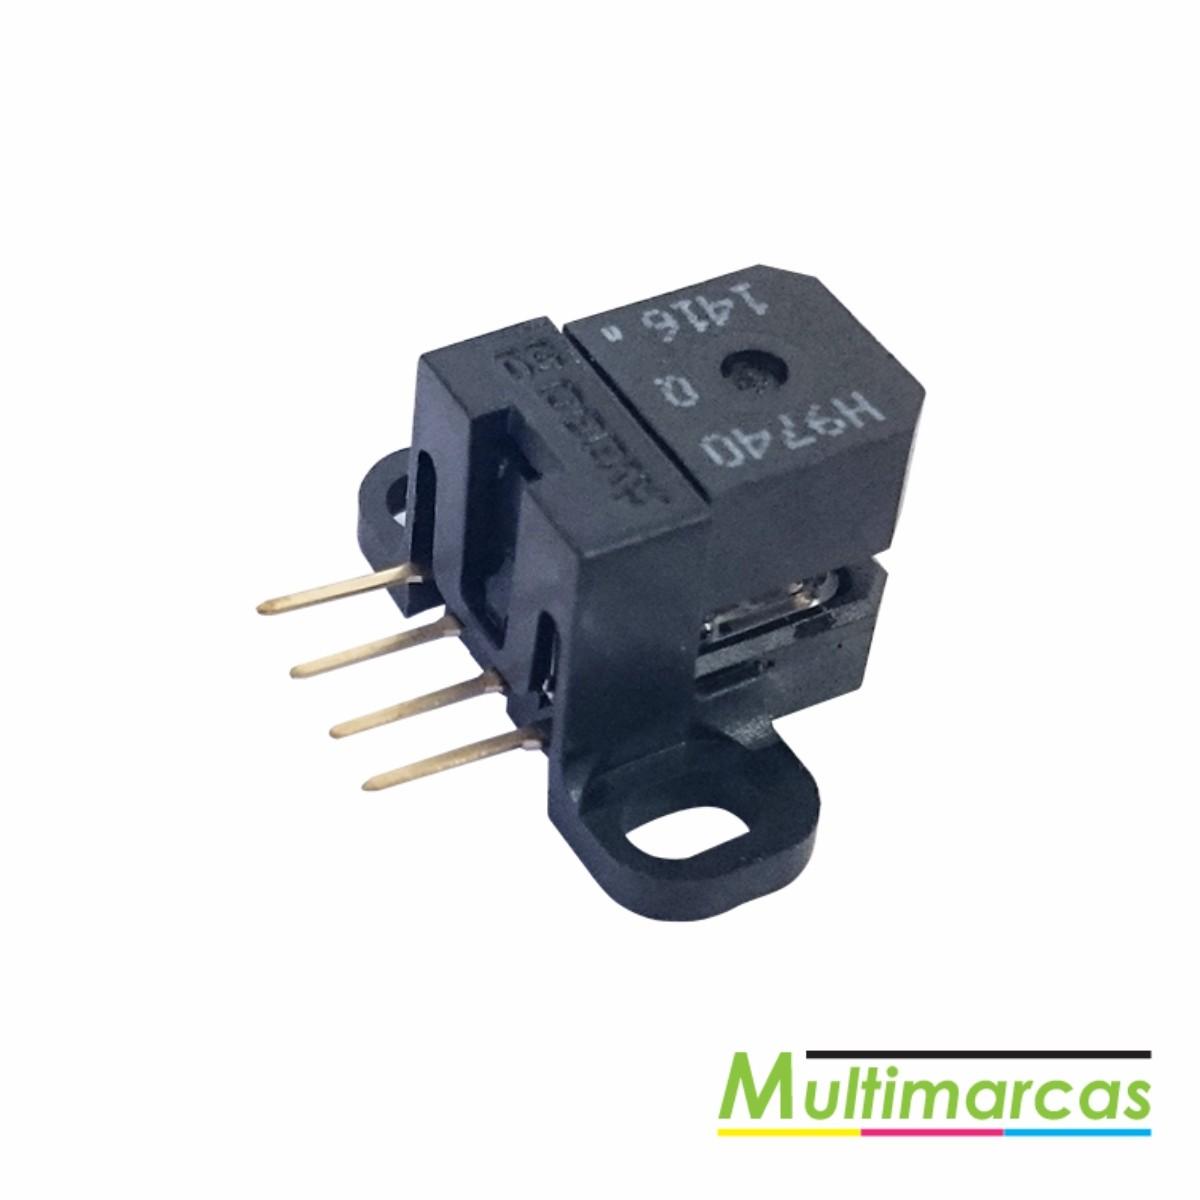 Sensor encoder H9740 - 180LPI